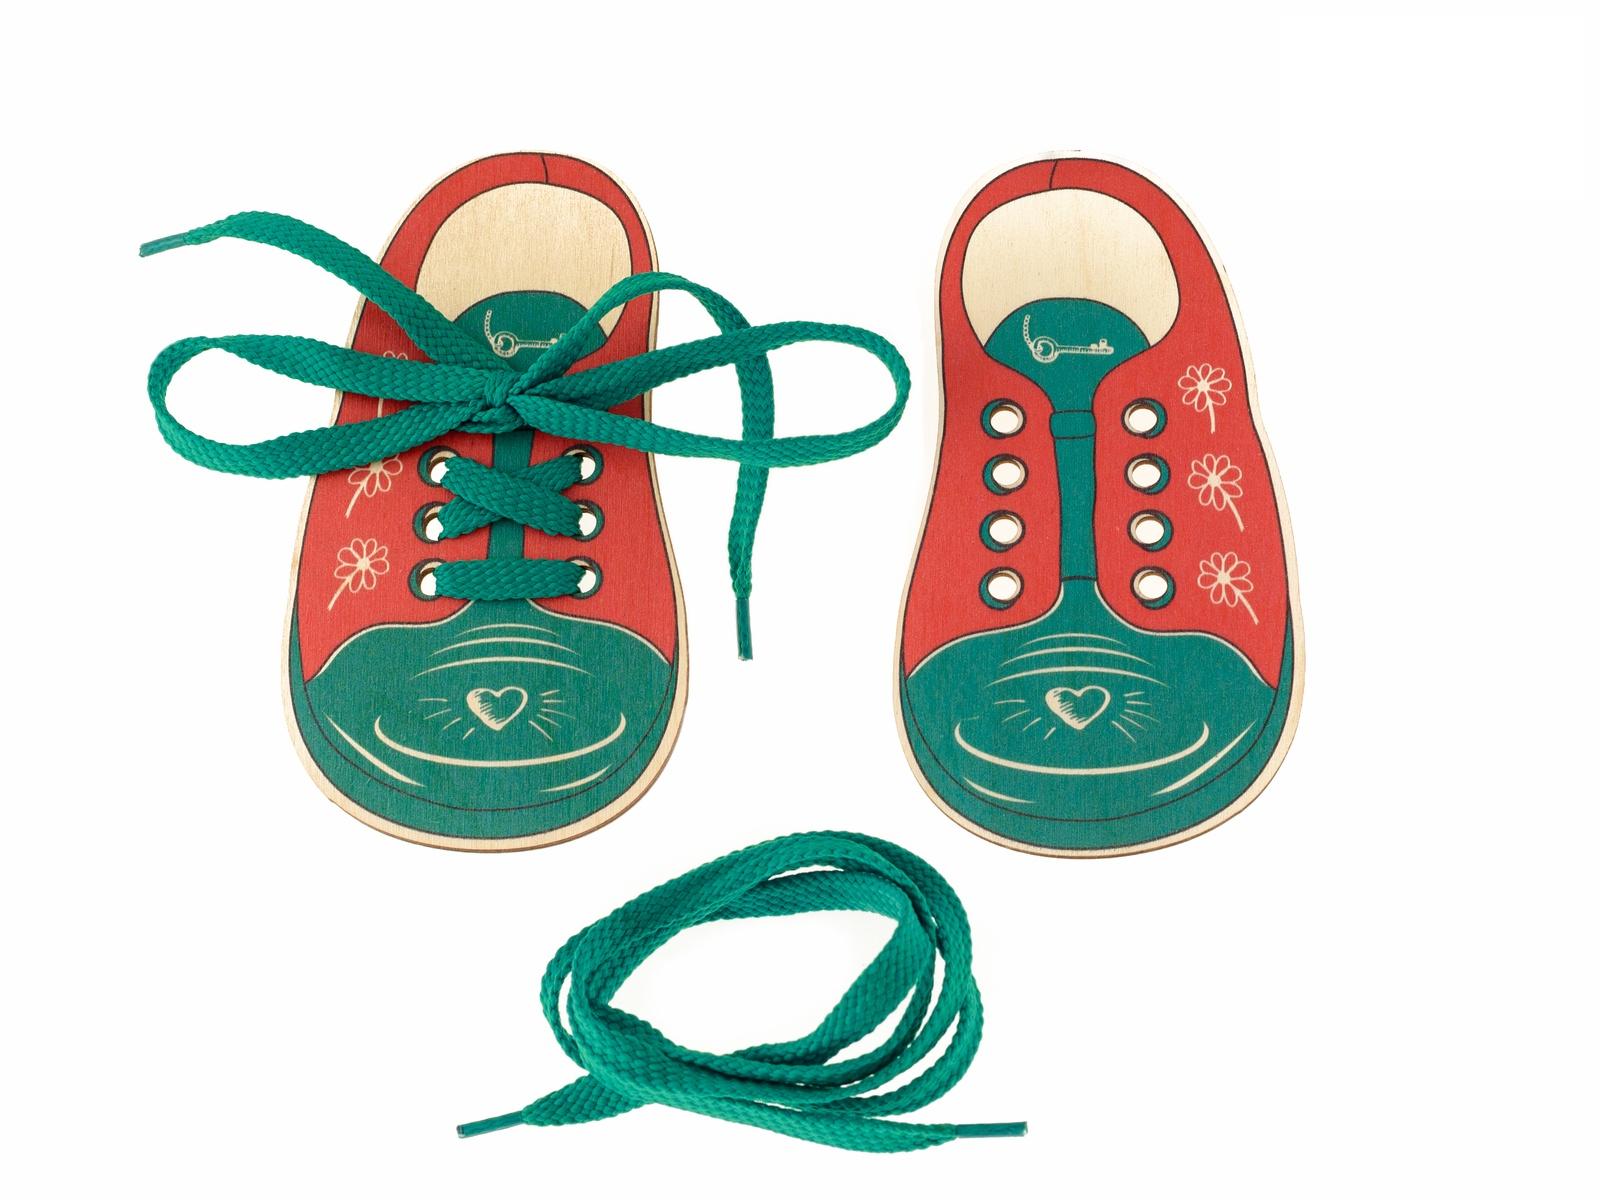 Шнуровка Анданте Д425а красный, зеленый